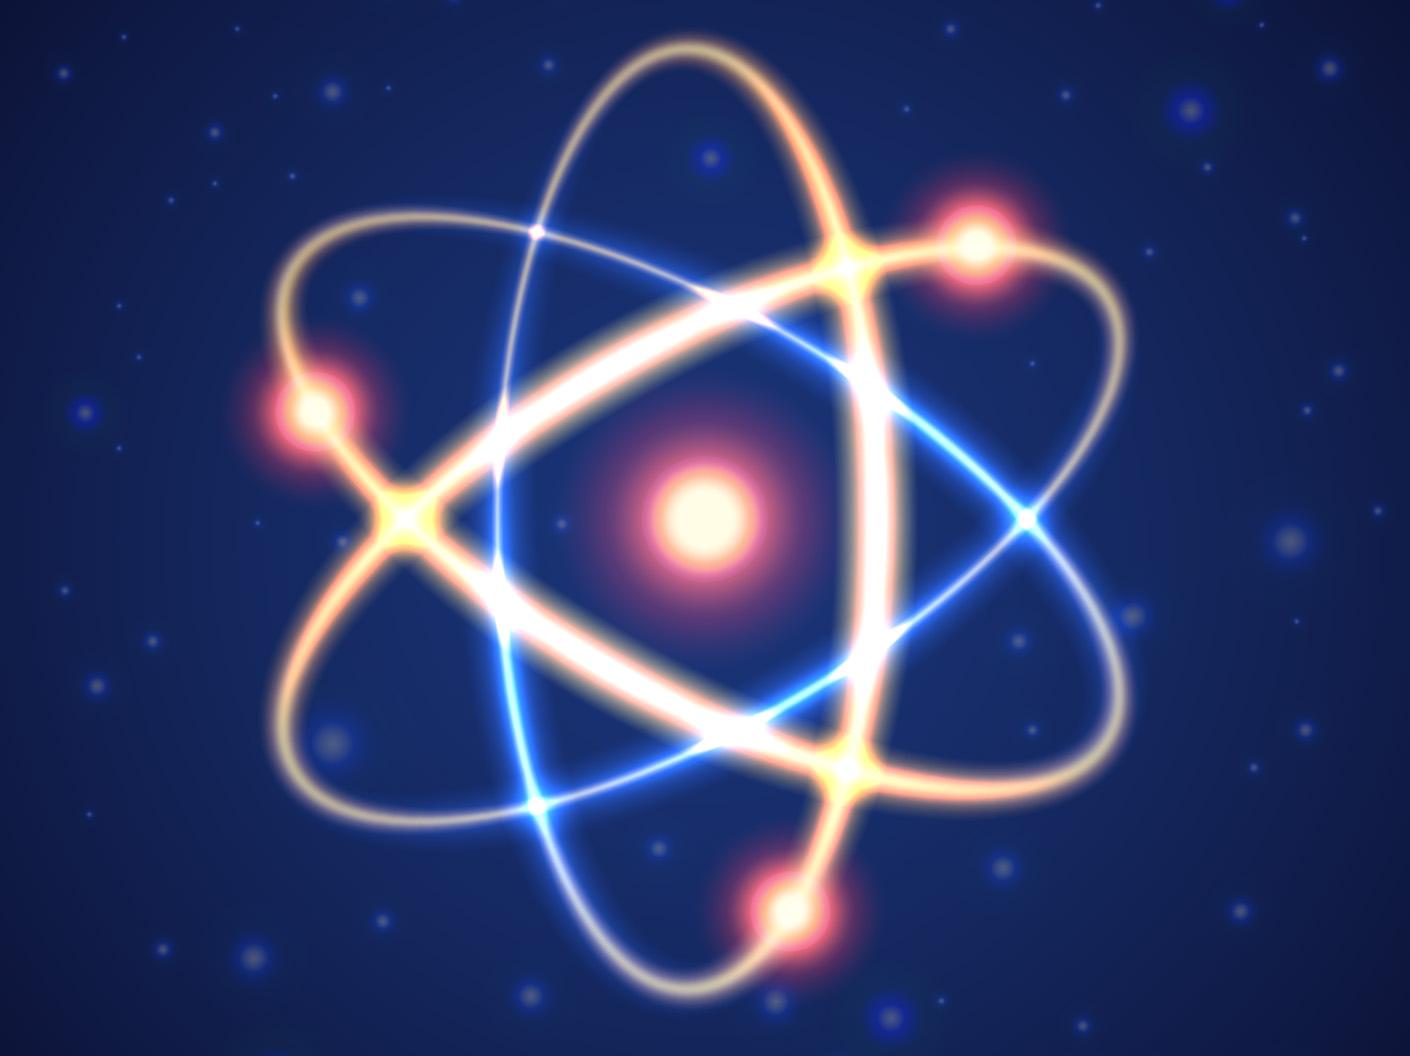 data-cke-saved-src=https://bilimgenc.tubitak.gov.tr/sites/default/files/toryum_uranyum_protaktinyum.jpg